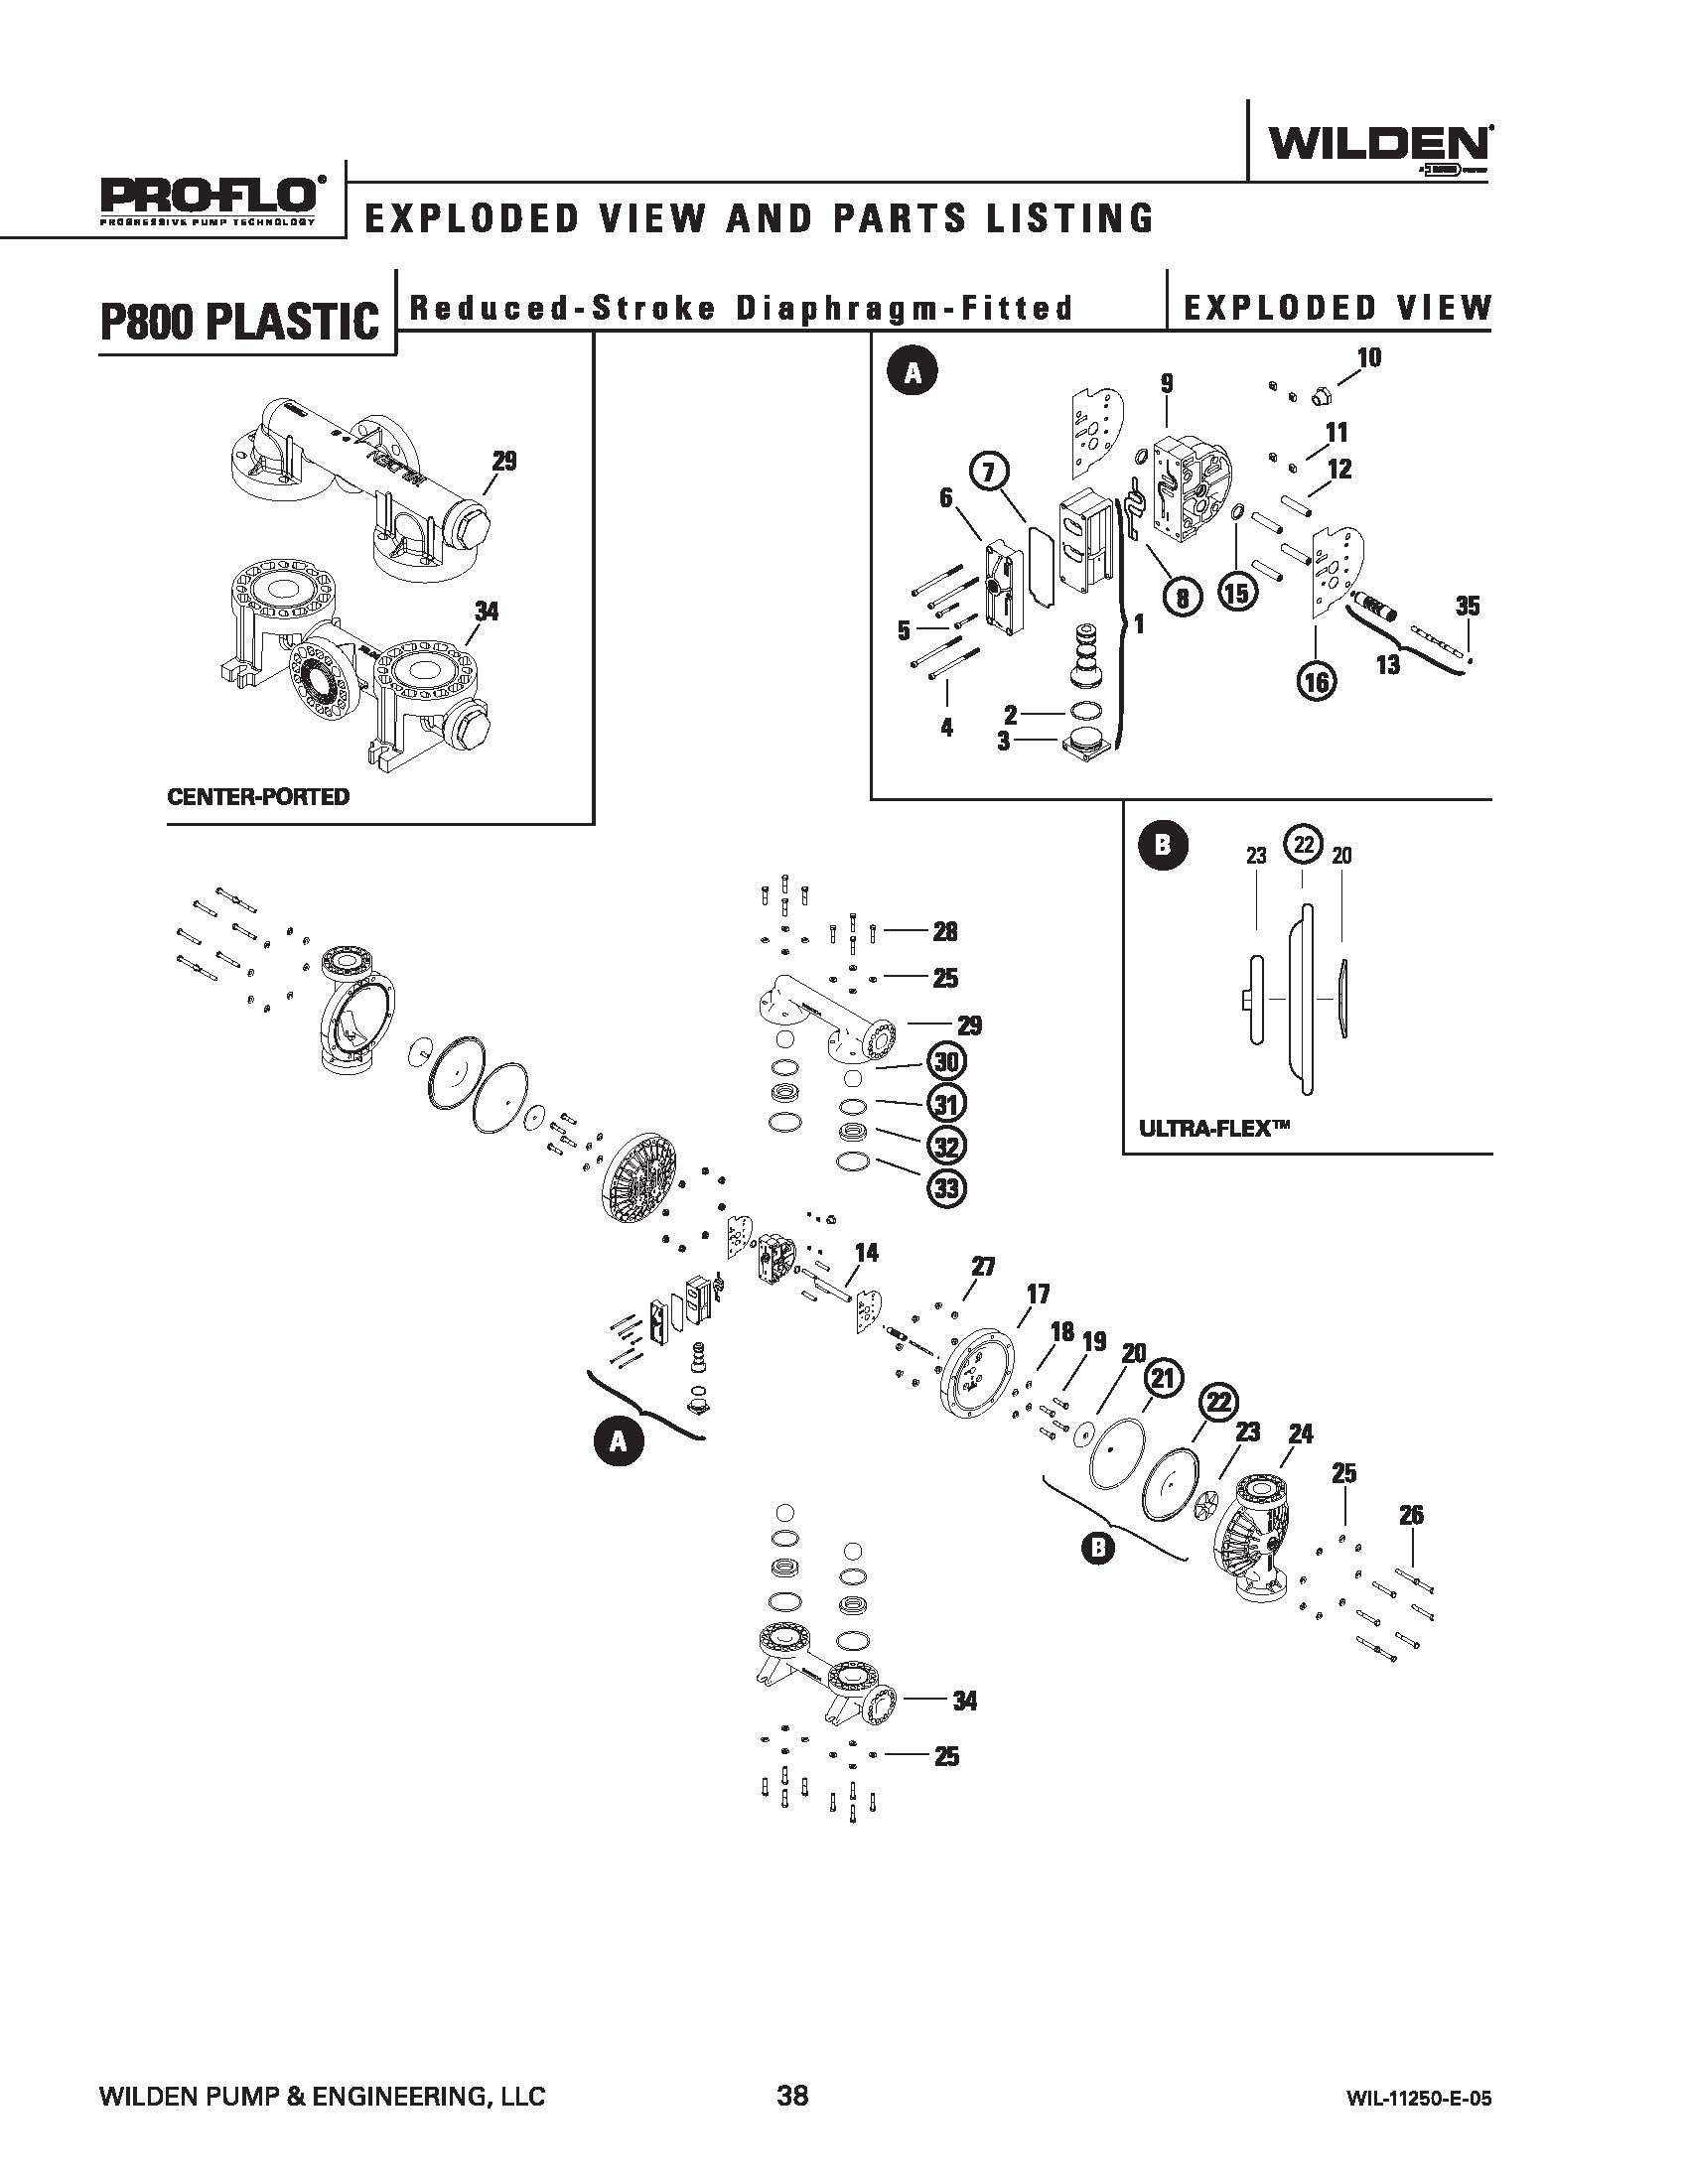 Wilden P800 Advanced Plastic Reduced Stroke